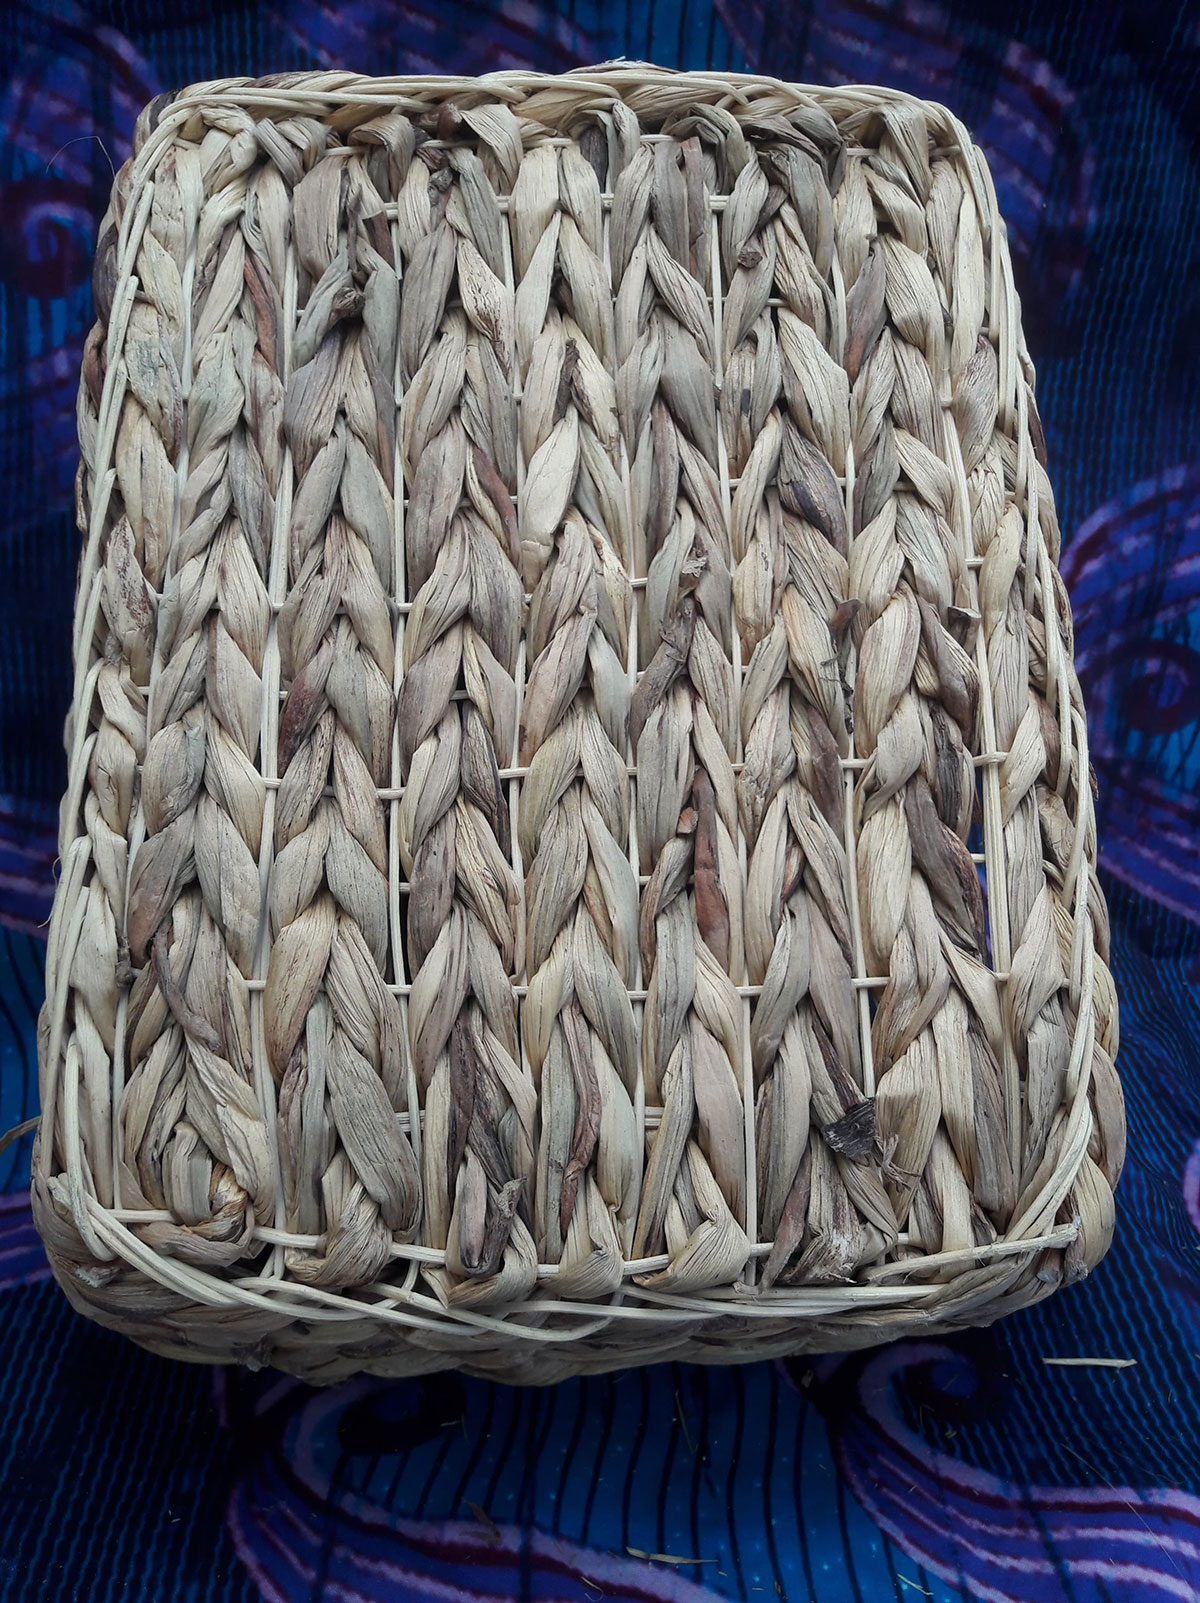 lit-hyacinthe-rattan-2